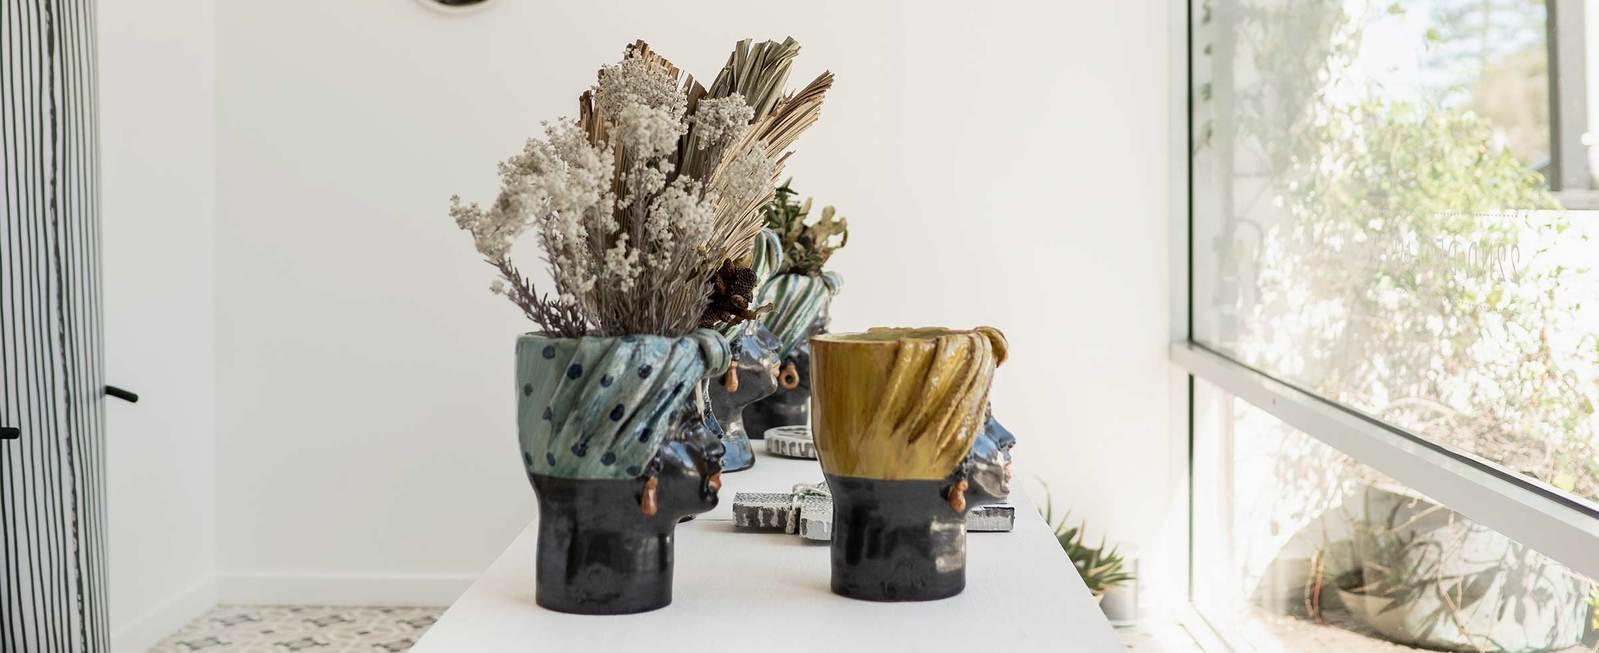 https://storage.googleapis.com/dtk-fenton-fenton/page/Sicilian-Alessi-vases-by_fenton-and-fenton_1600x_1548218429098.jpg